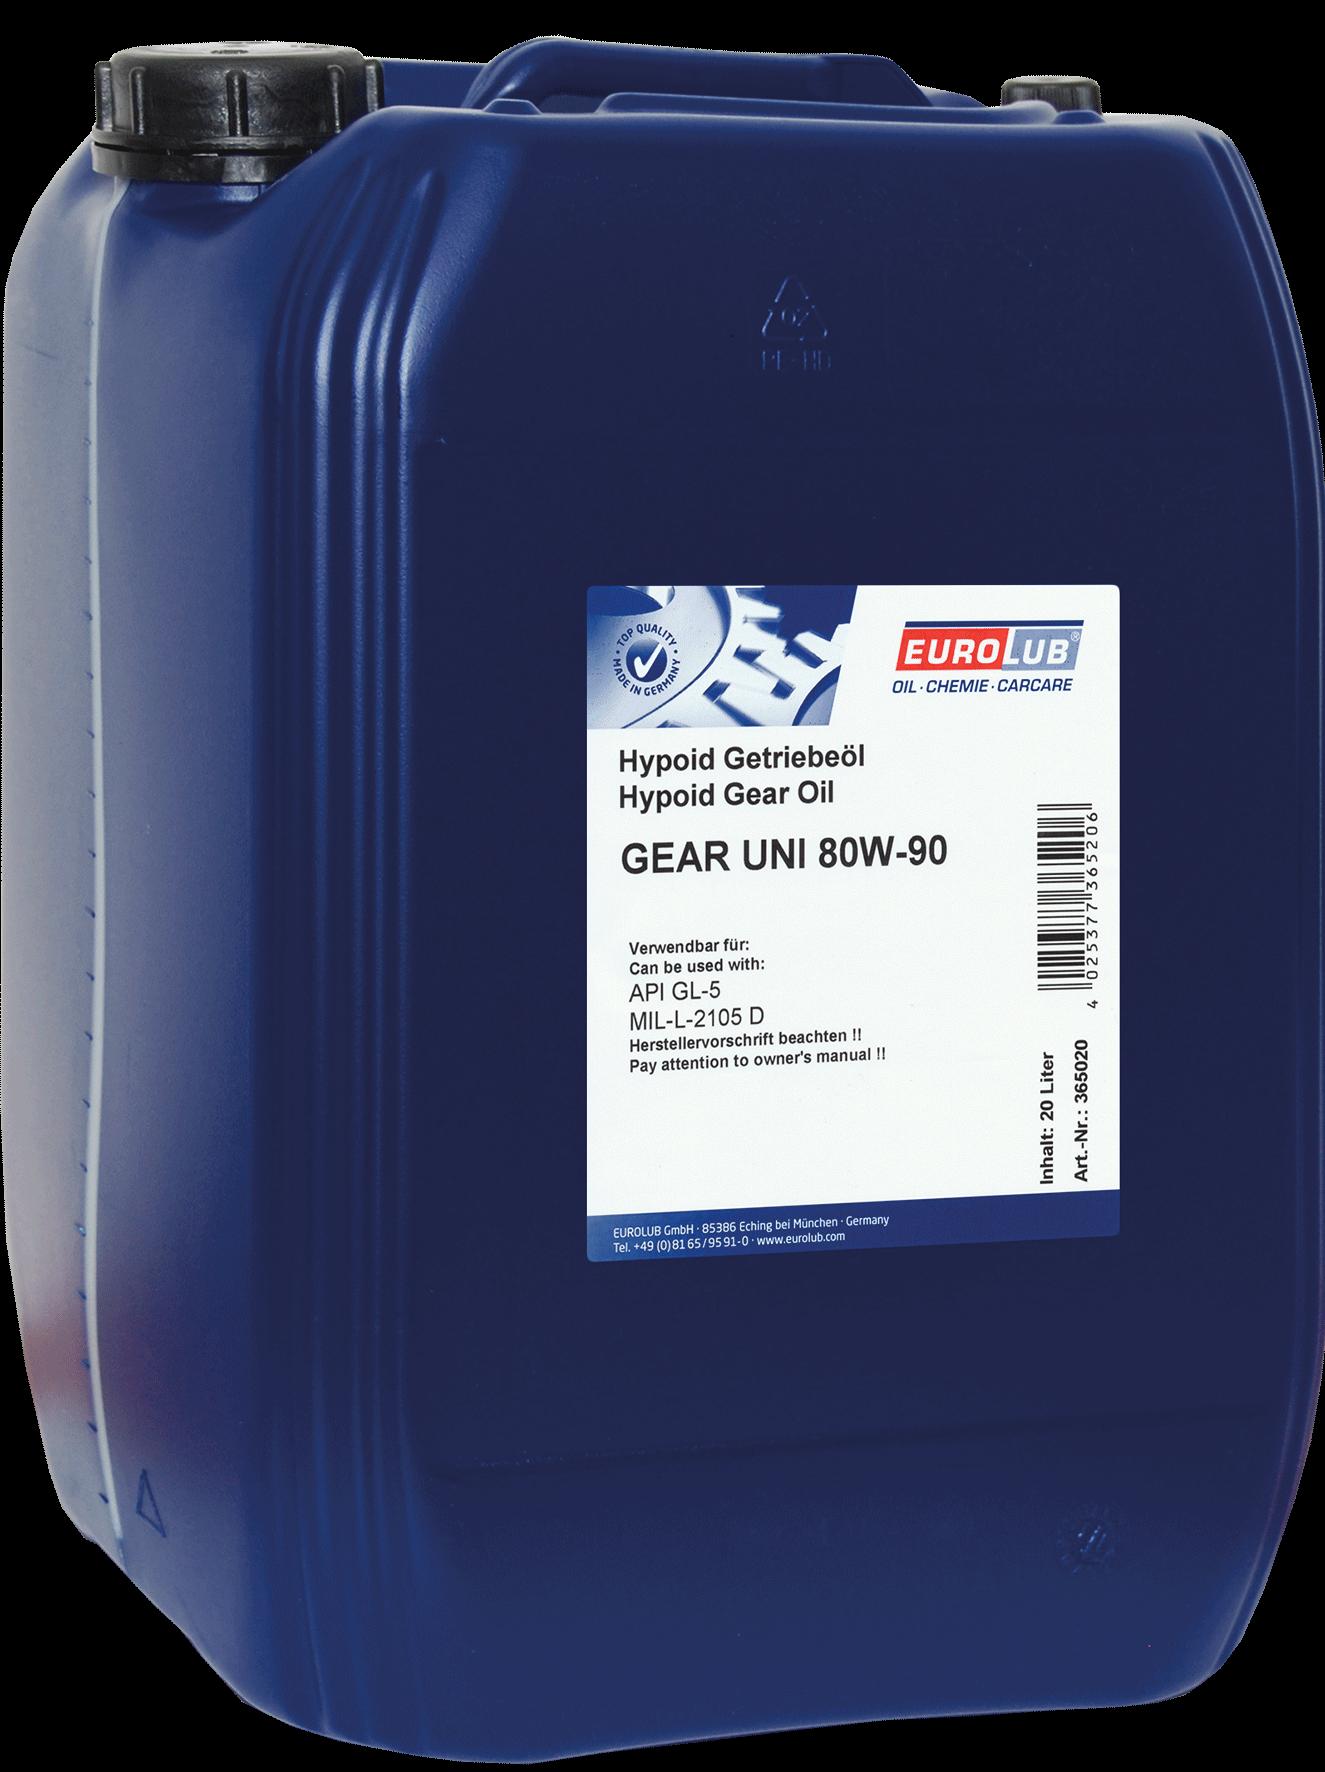 EUROLUB Gear Uni SAE 80W/90 (минеральное), 20л